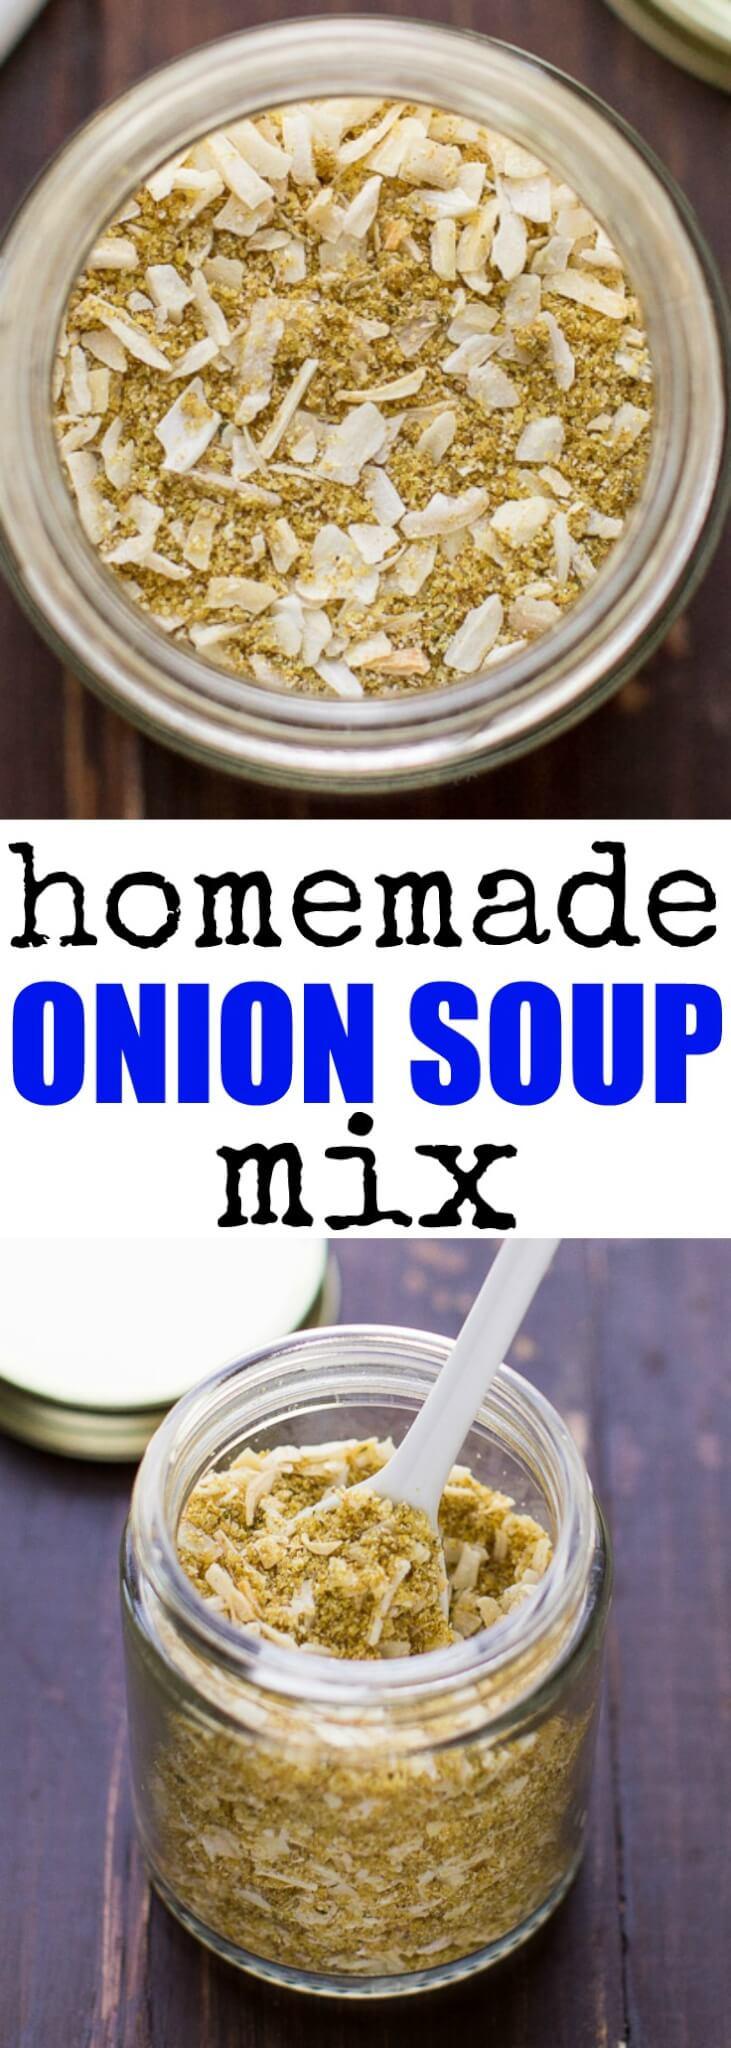 Homemade Onion Soup Mix  homemade onion soup mix